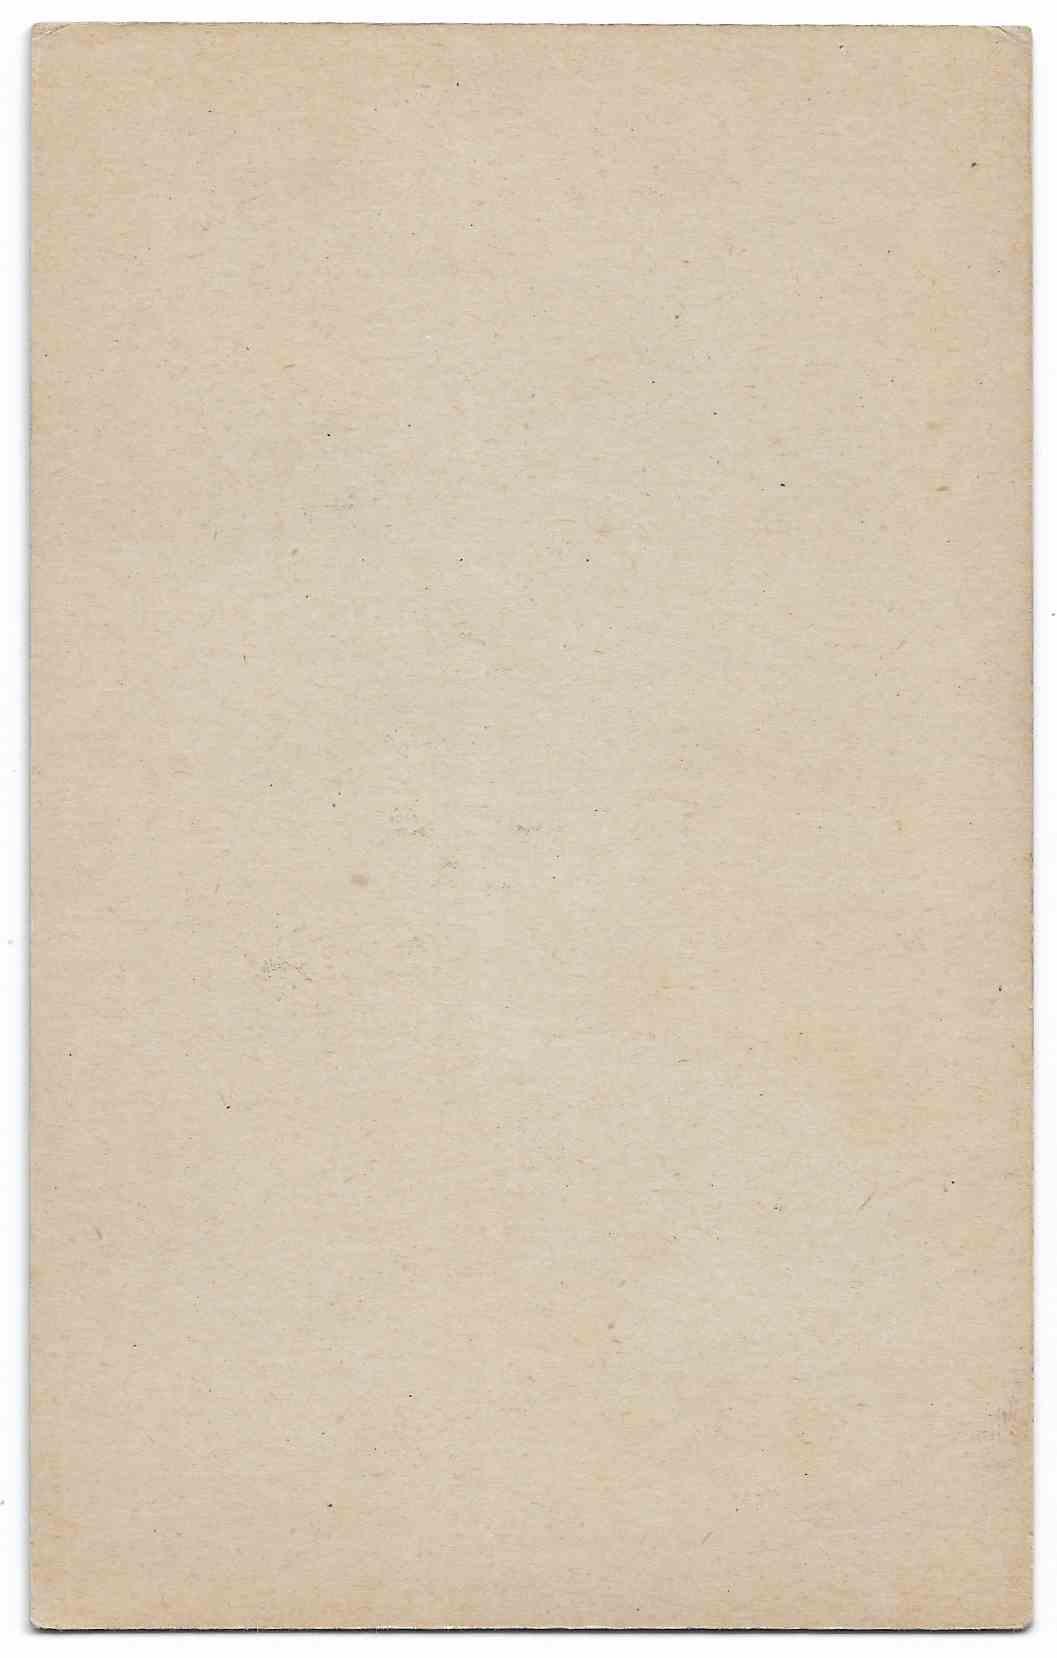 1947 Exhibits Bob Feller card back image